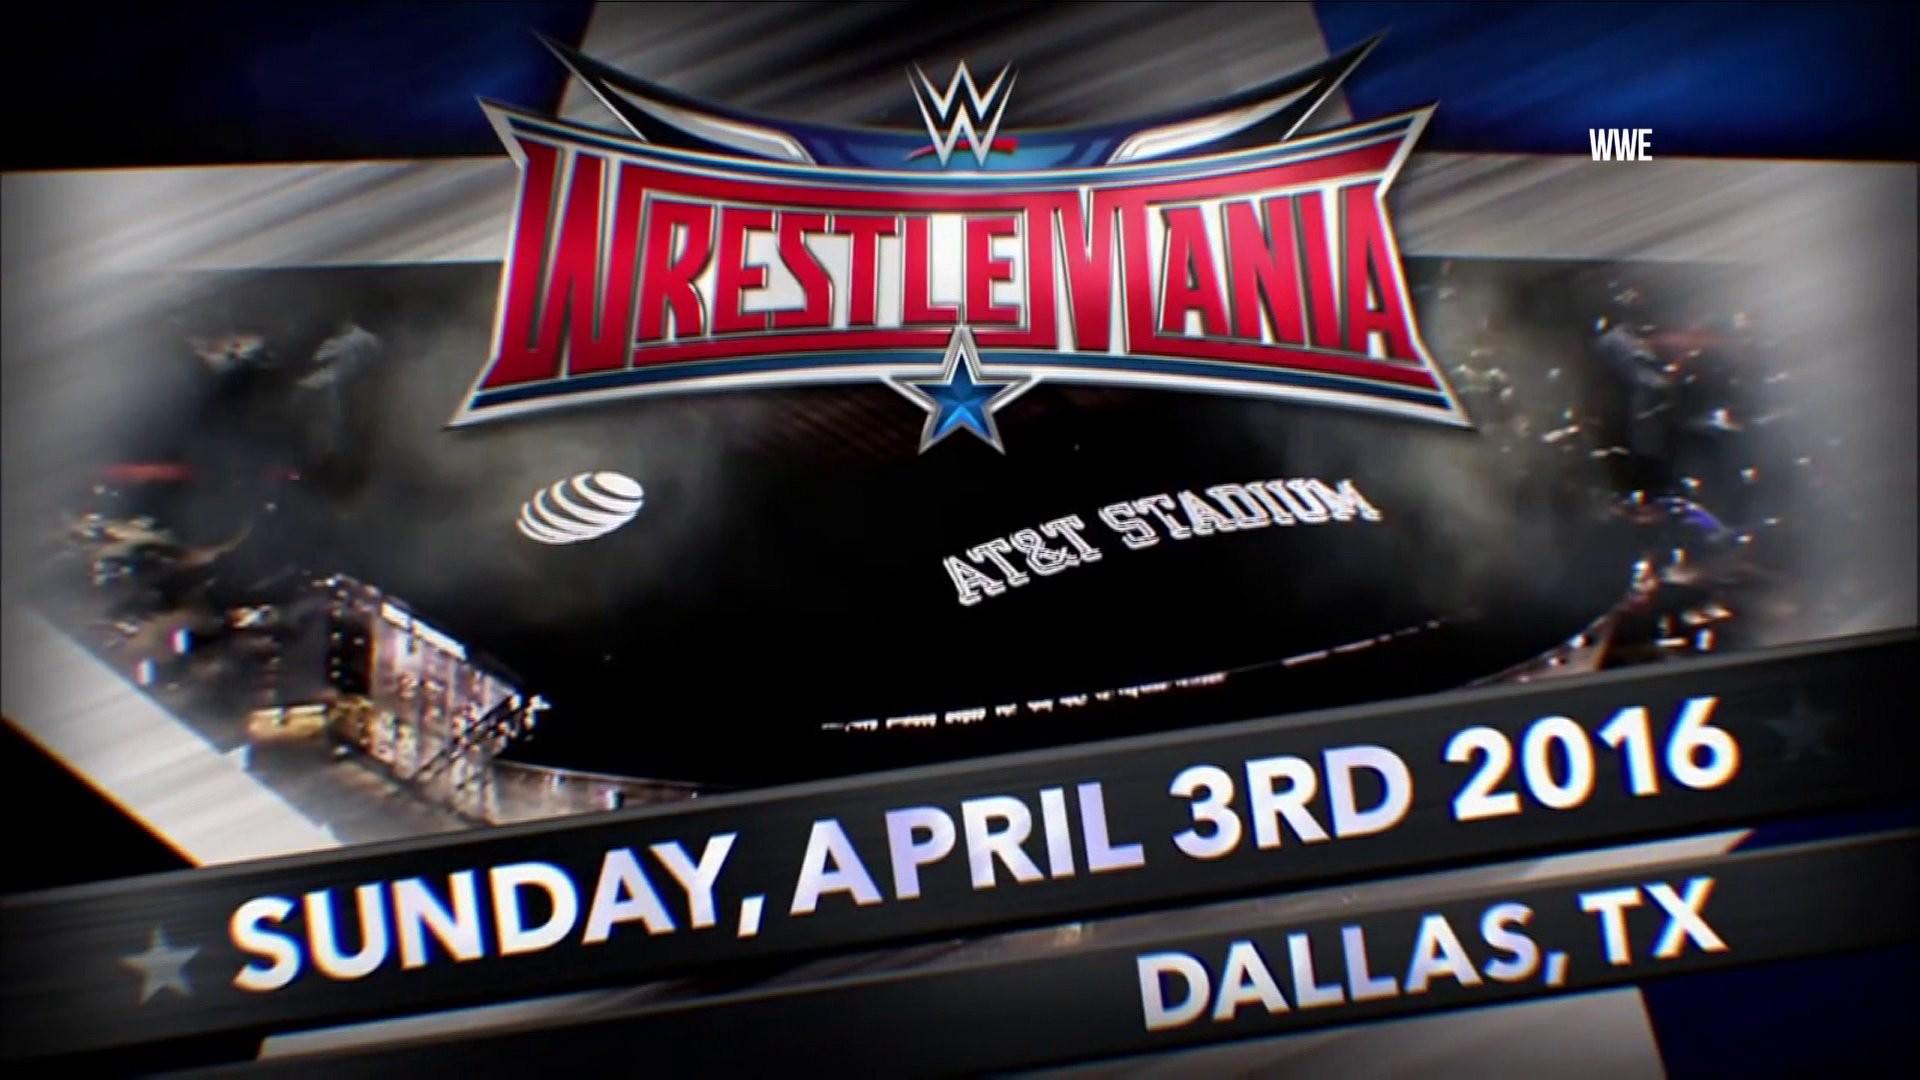 WWE Wrestlemania 32 Wallpaper (80+ Images